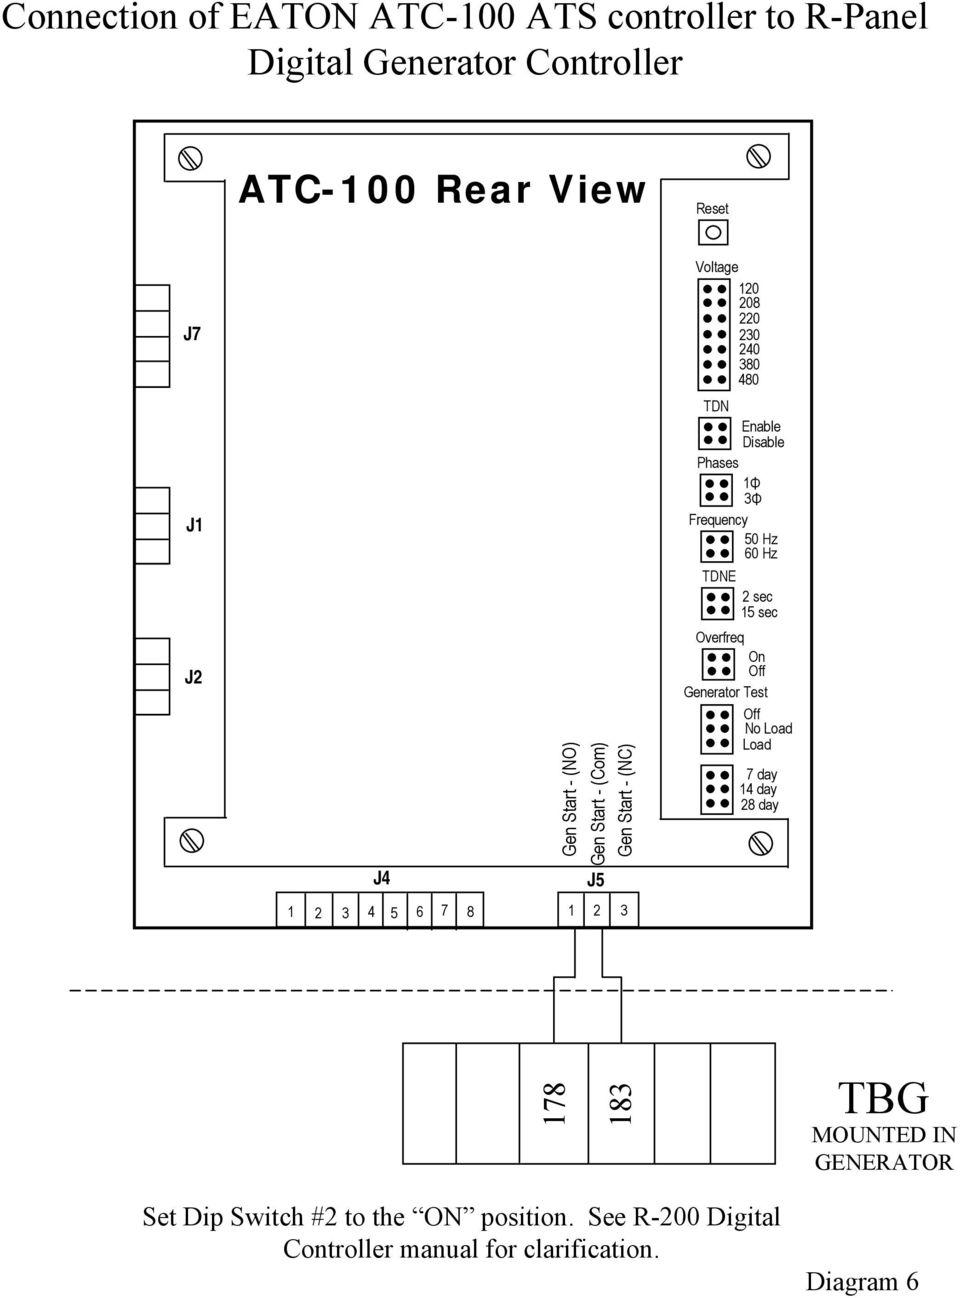 hight resolution of 3 frequency 50 hz 60 hz tdne 2 sec 15 sec overfreq on off generator test